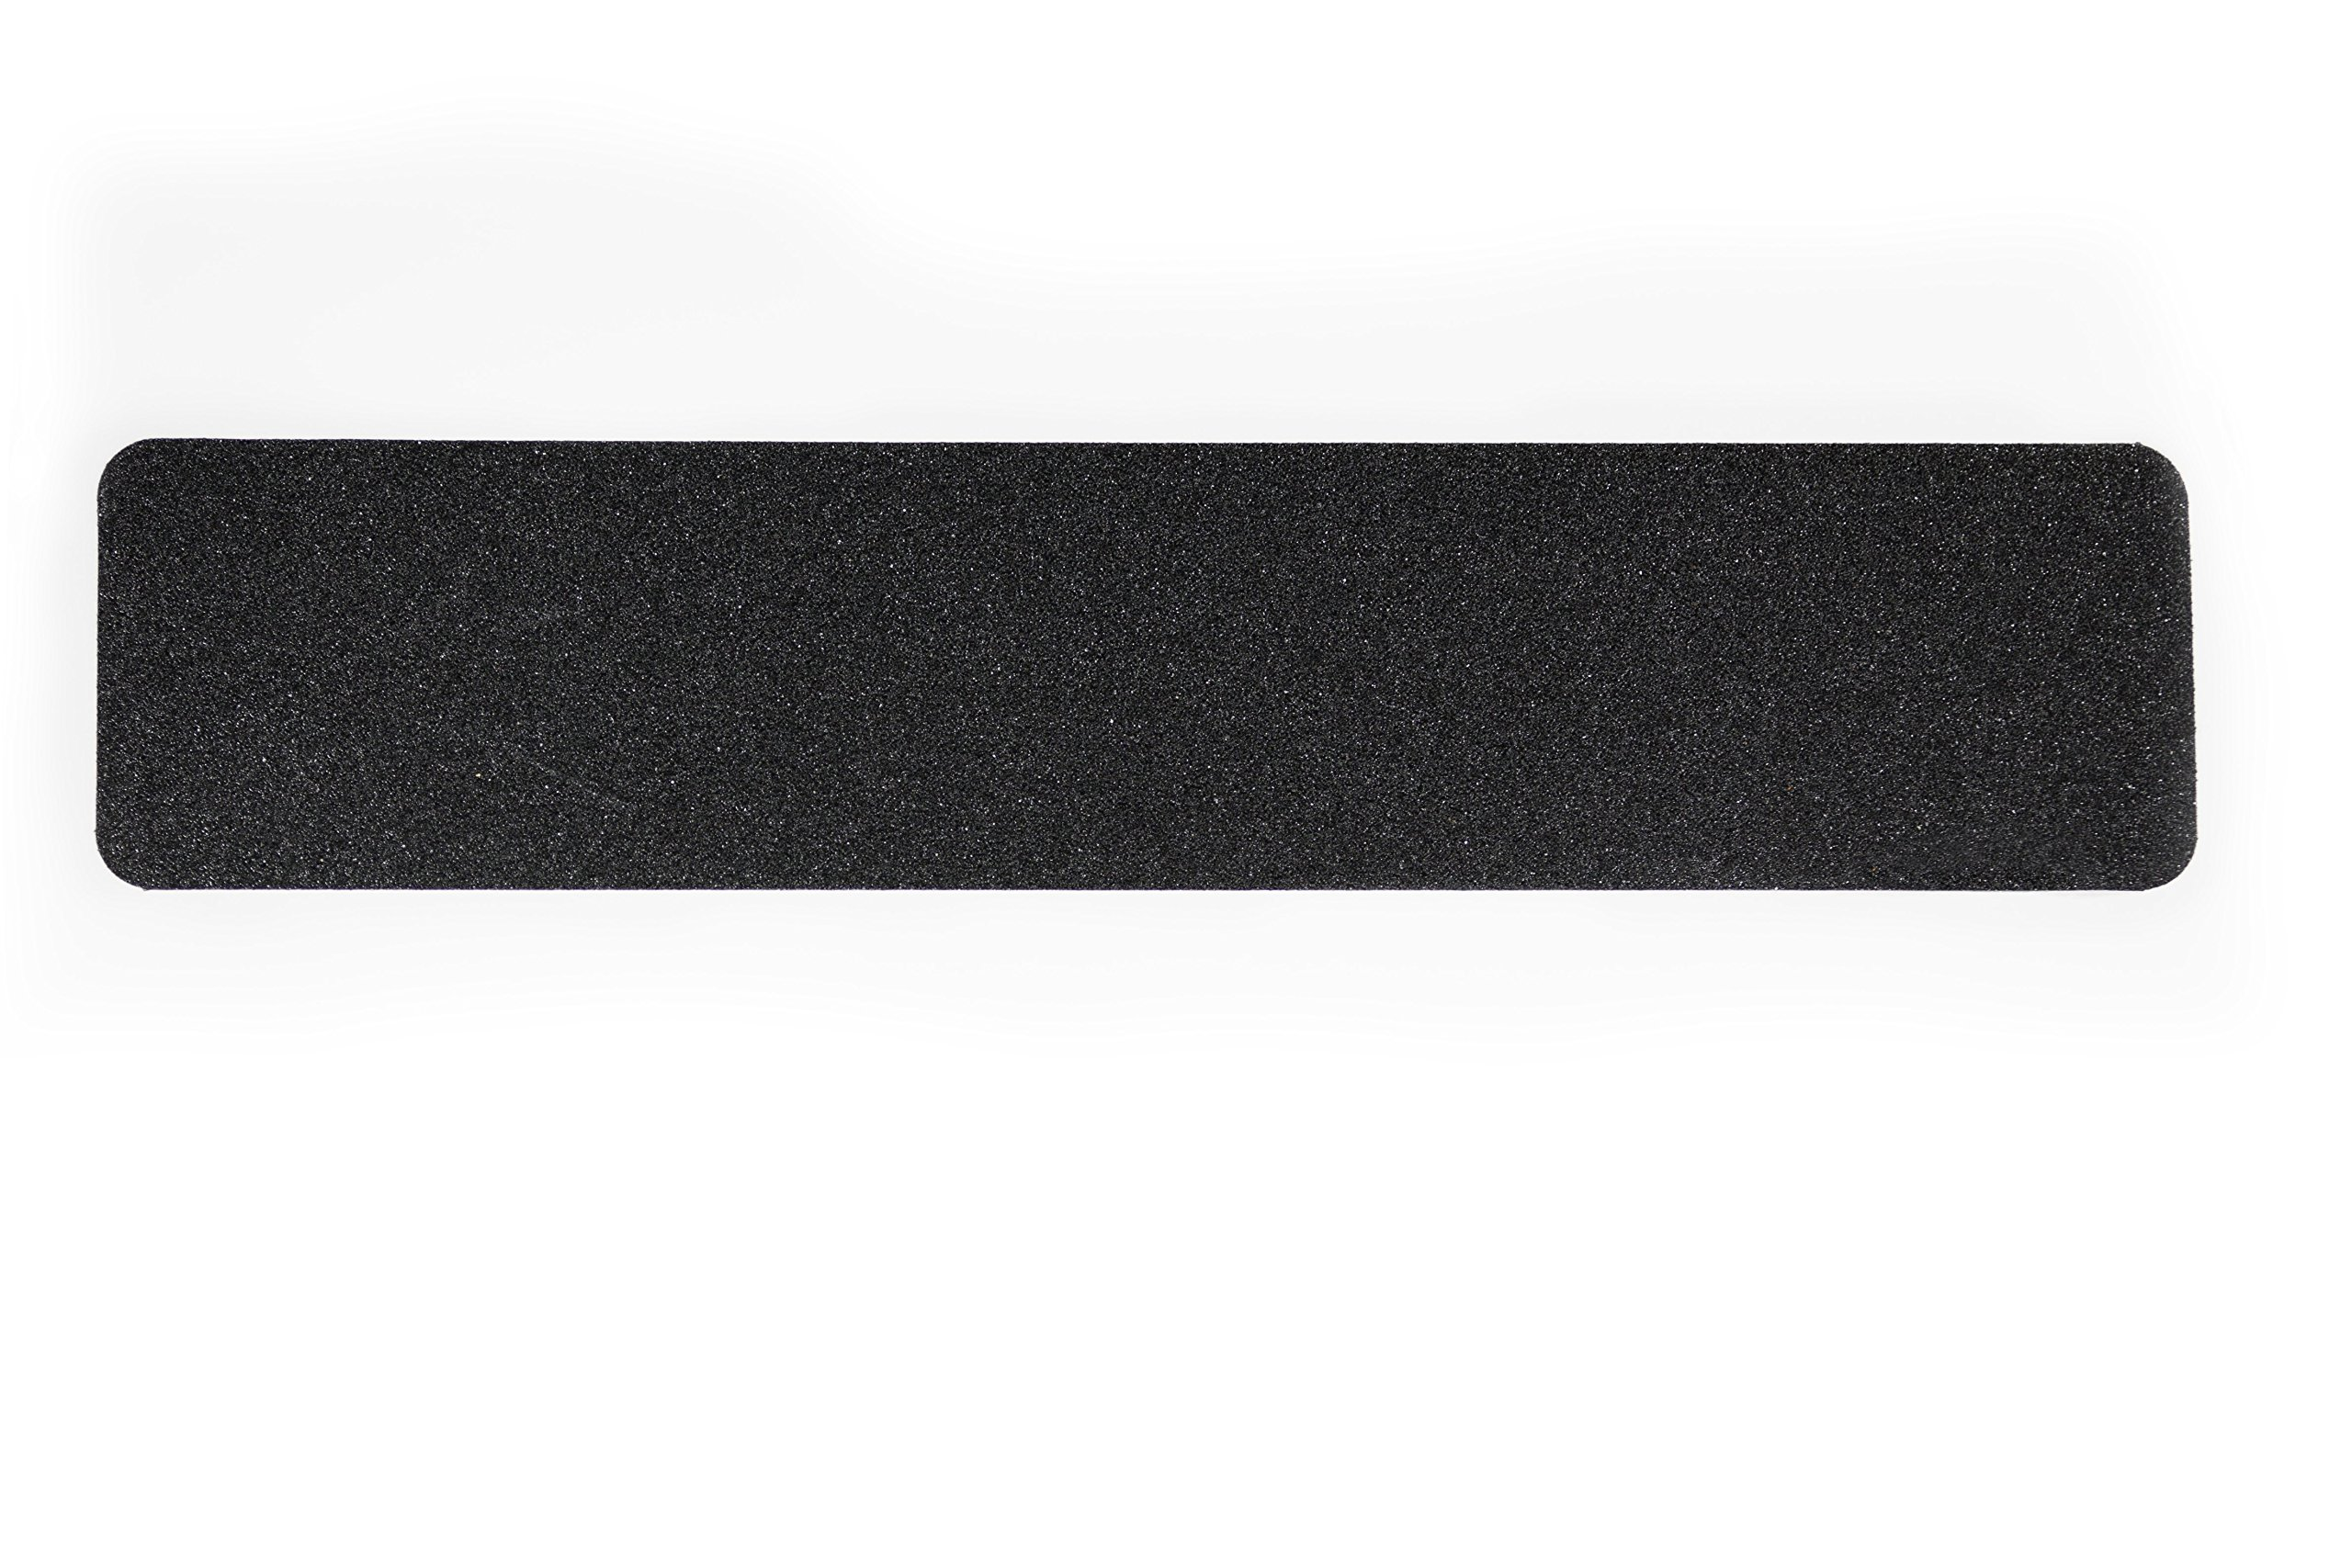 Slip Guard Non-Slip Stair Tape - Indoor & Outdoor